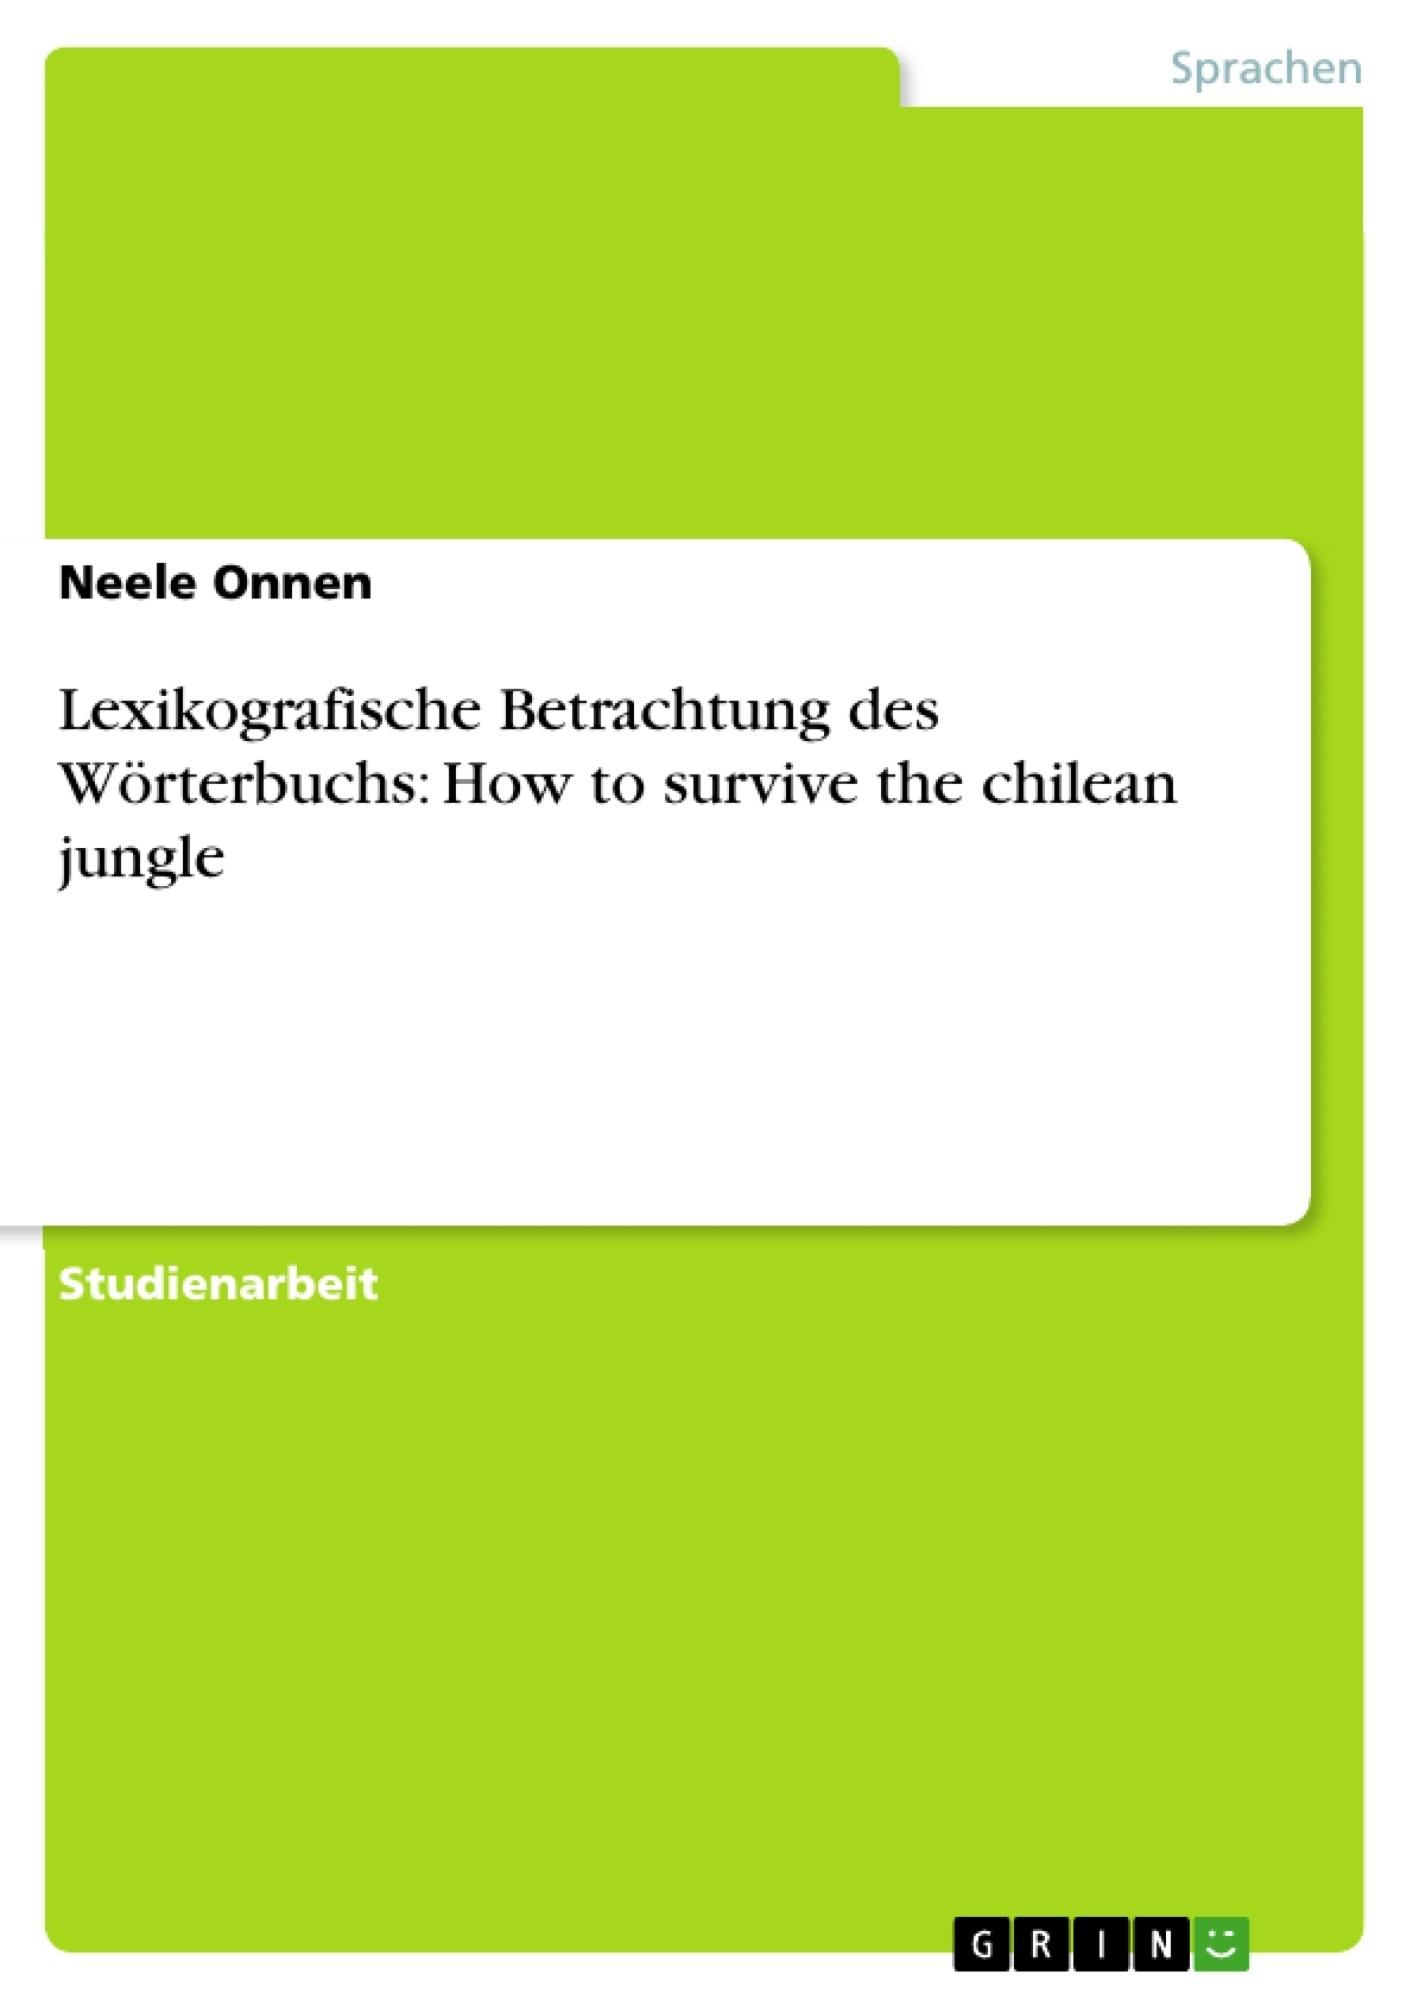 Titel: Lexikografische Betrachtung des Wörterbuchs: How to survive the chilean jungle